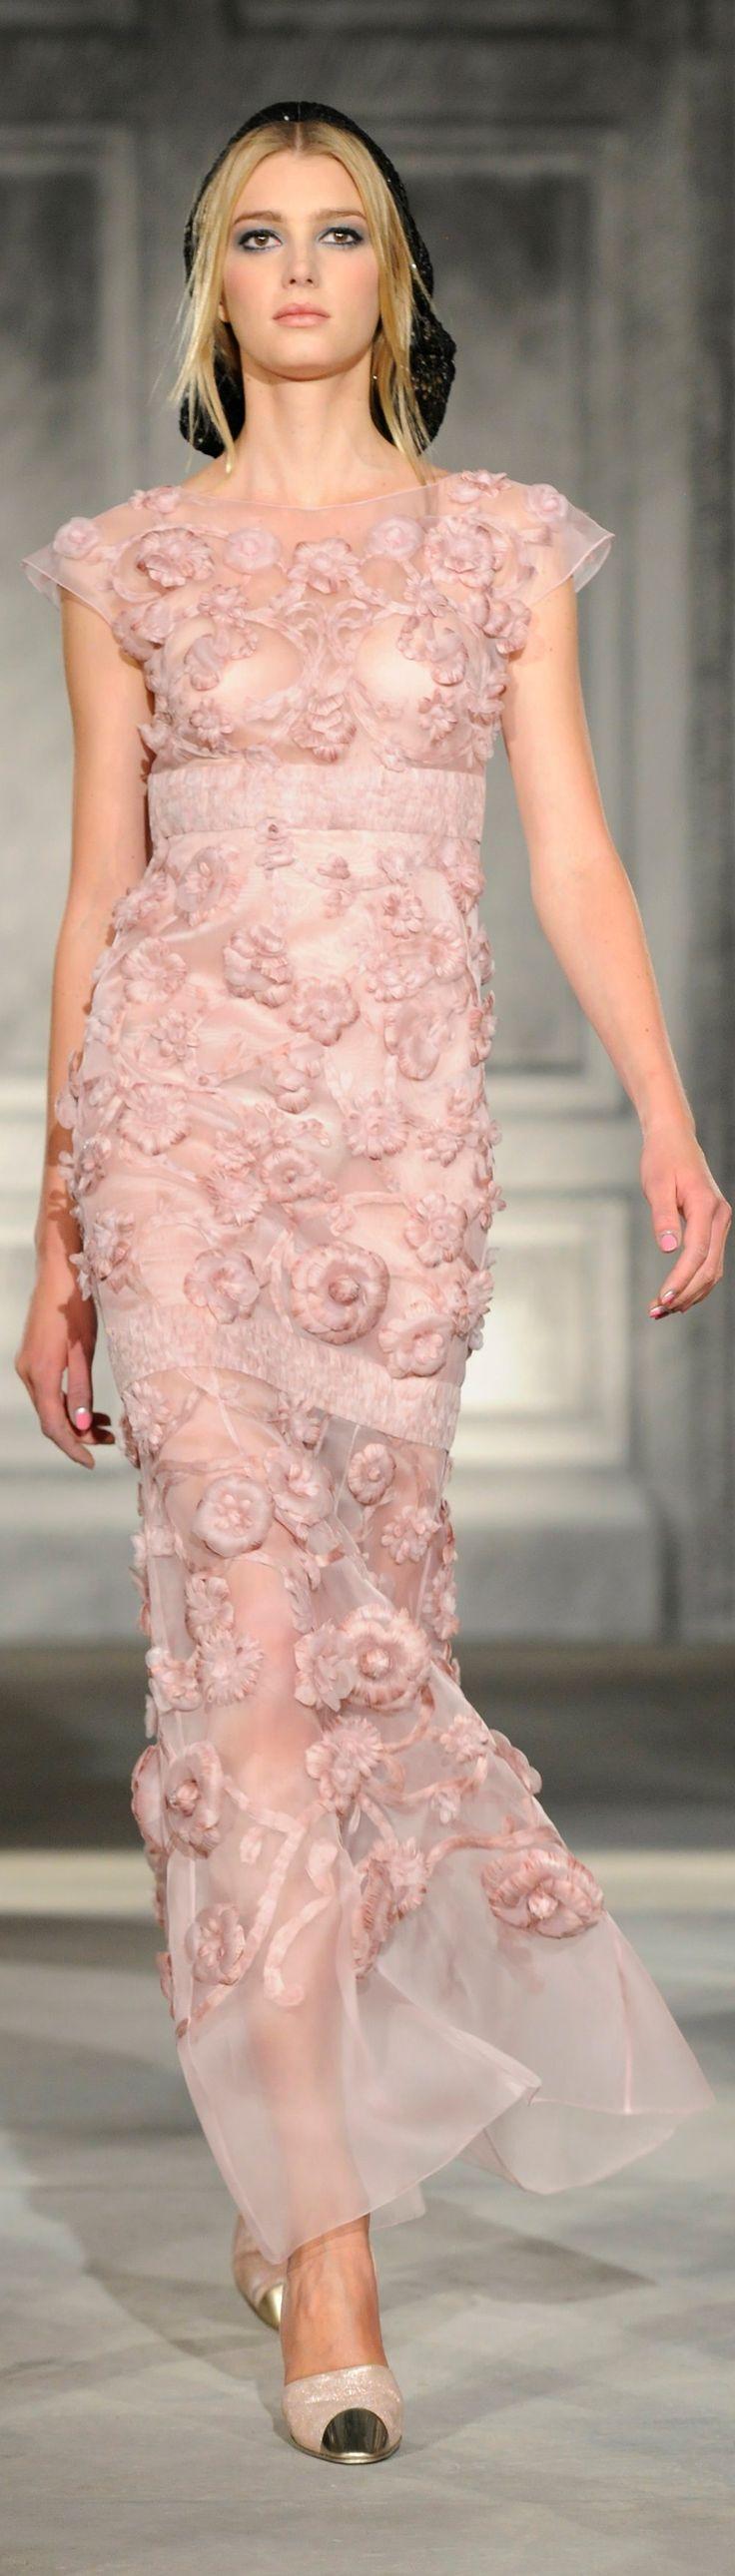 Mejores 280 imágenes de ROSE PINK en Pinterest | Moda rosada ...